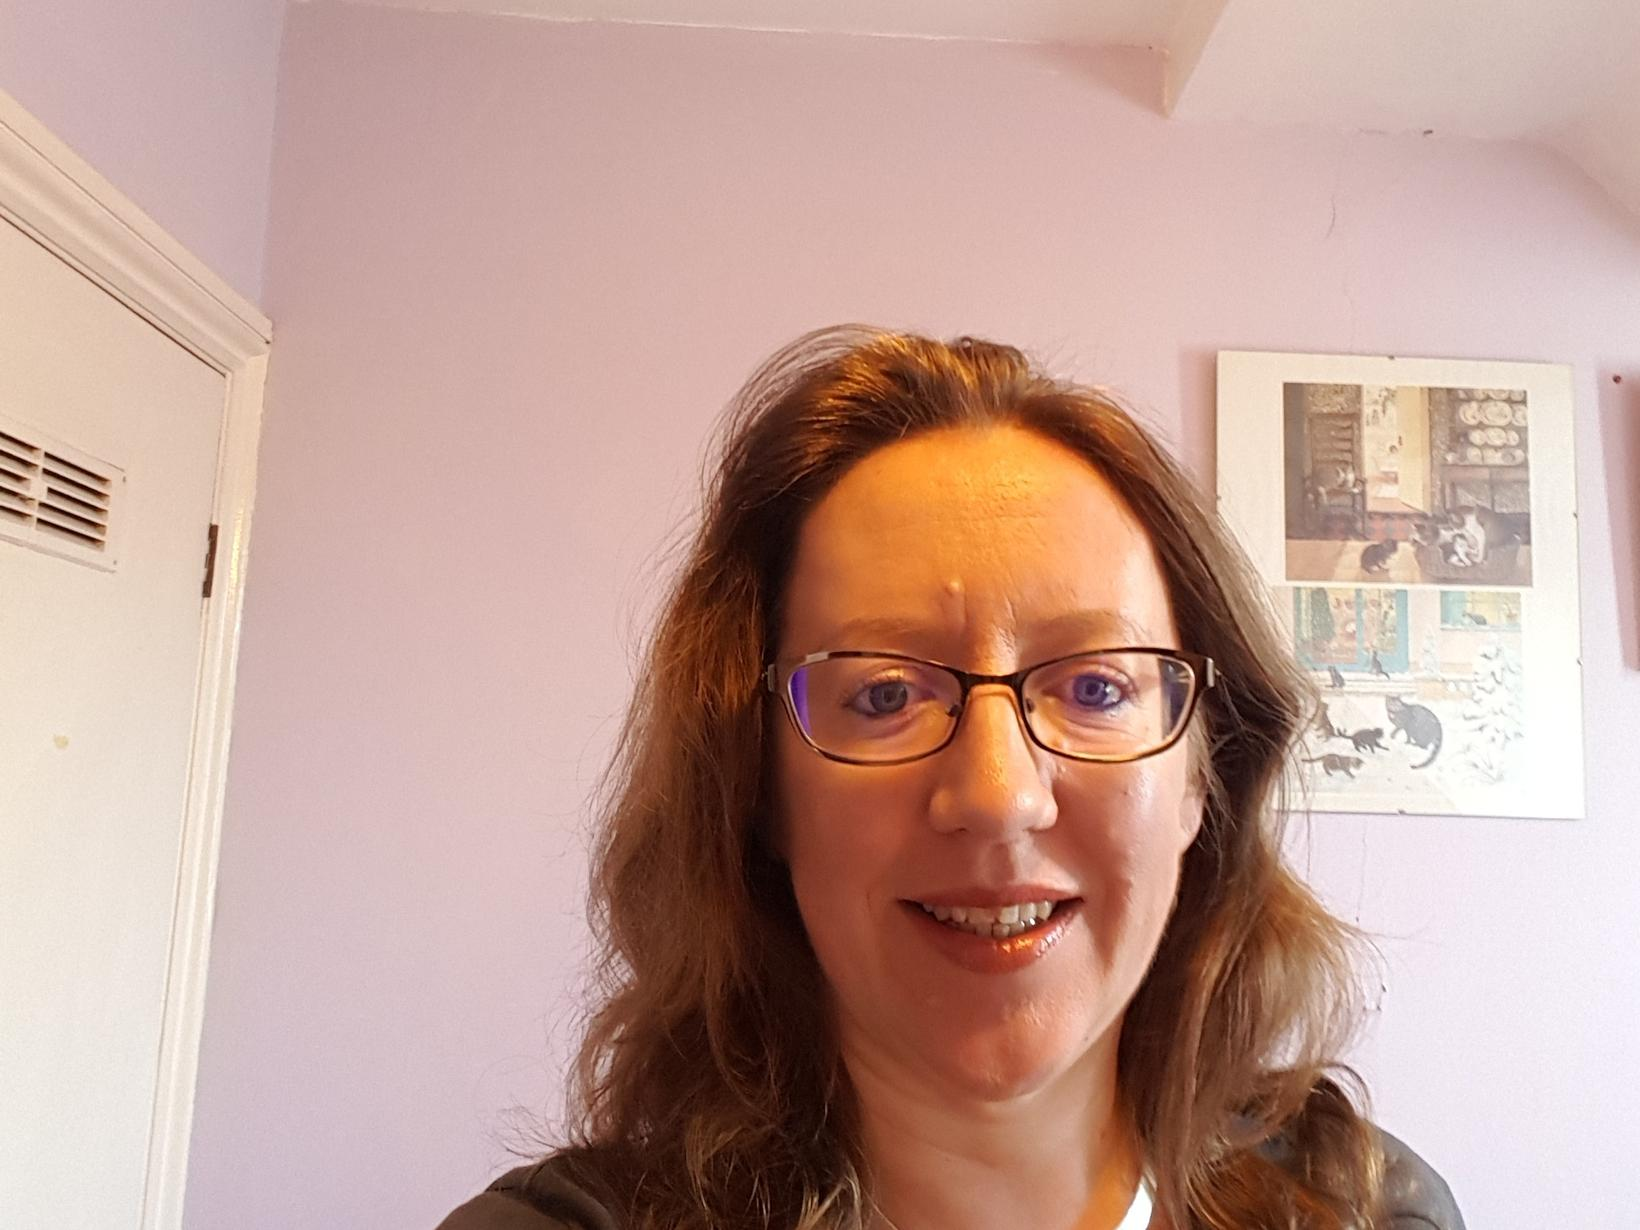 Heather from Southampton, United Kingdom